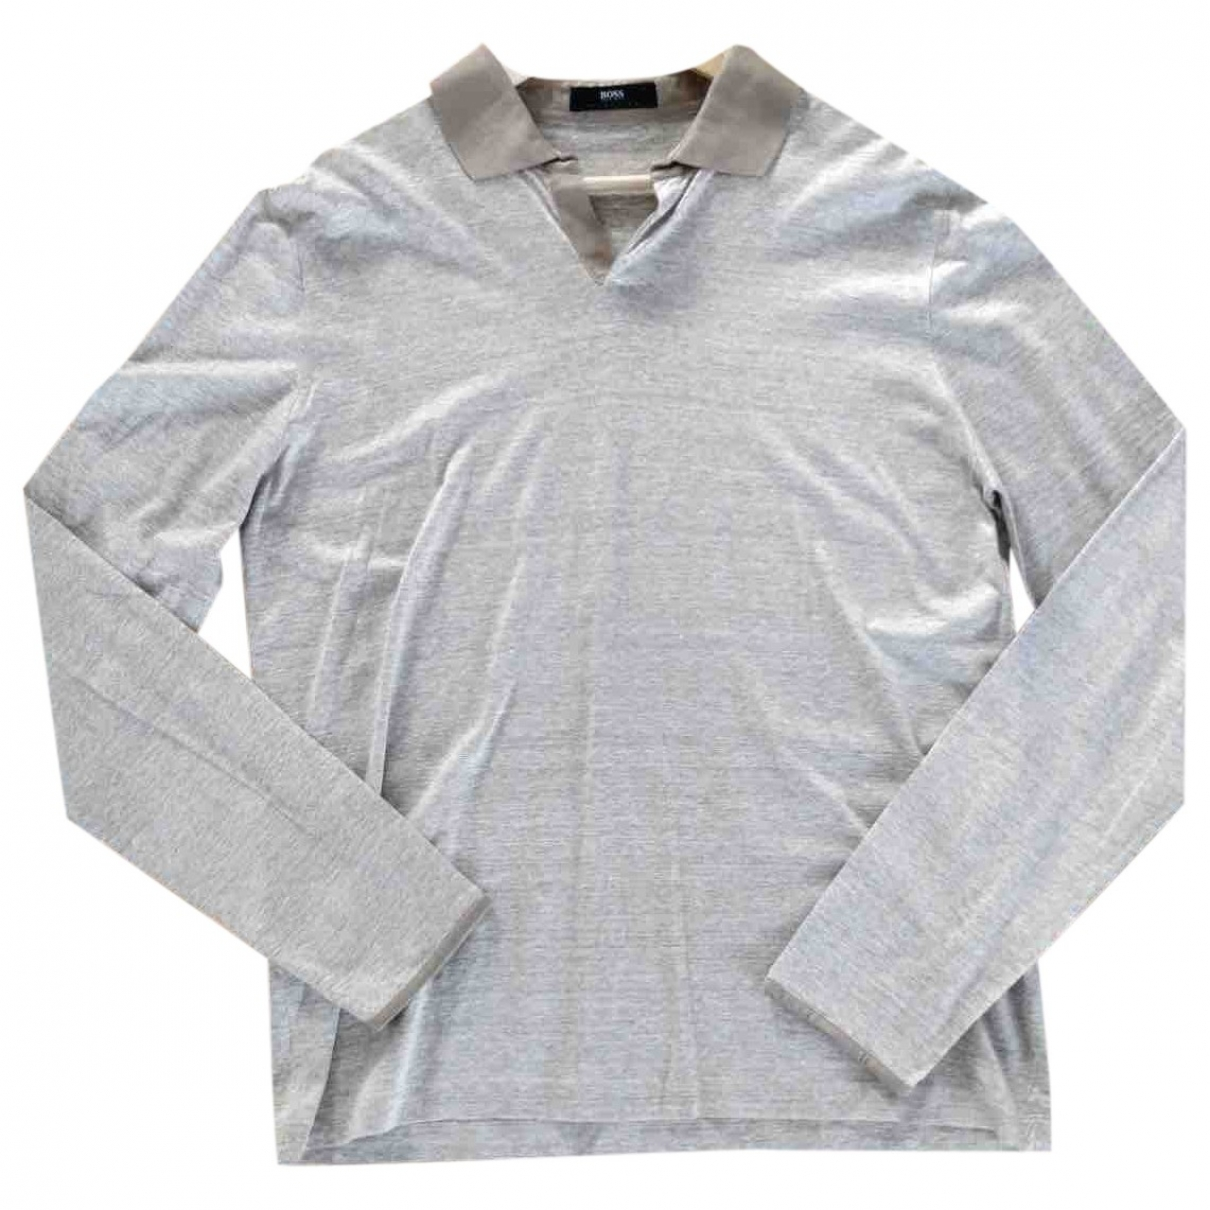 Hugo Boss \N Beige Cotton Polo shirts for Men L International